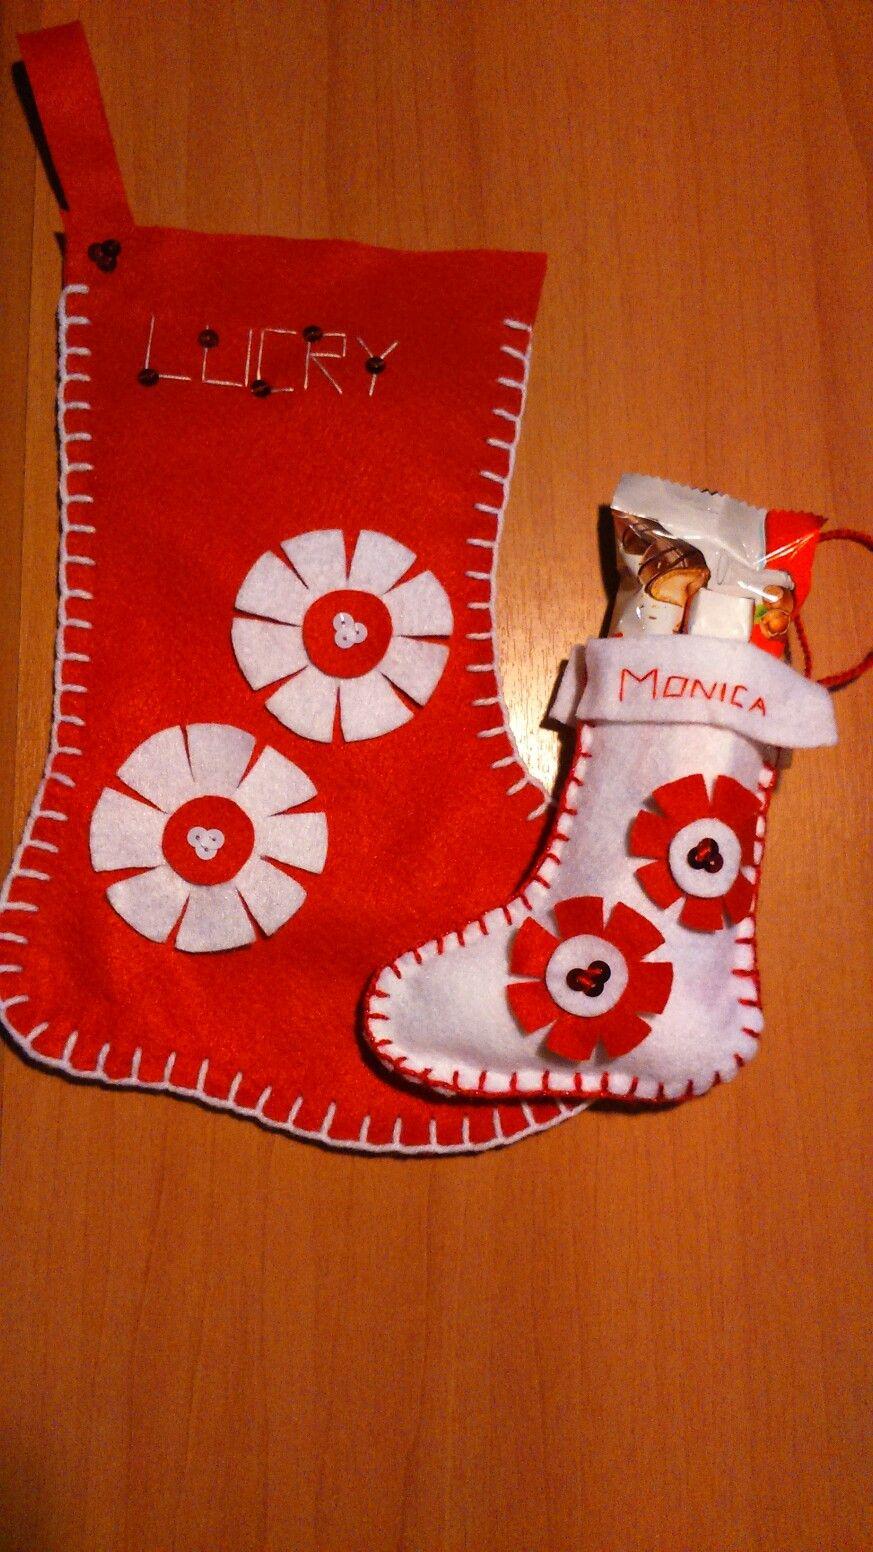 Calze Epifania fai da te, realizzate con panno lencio, lana e paillettes...